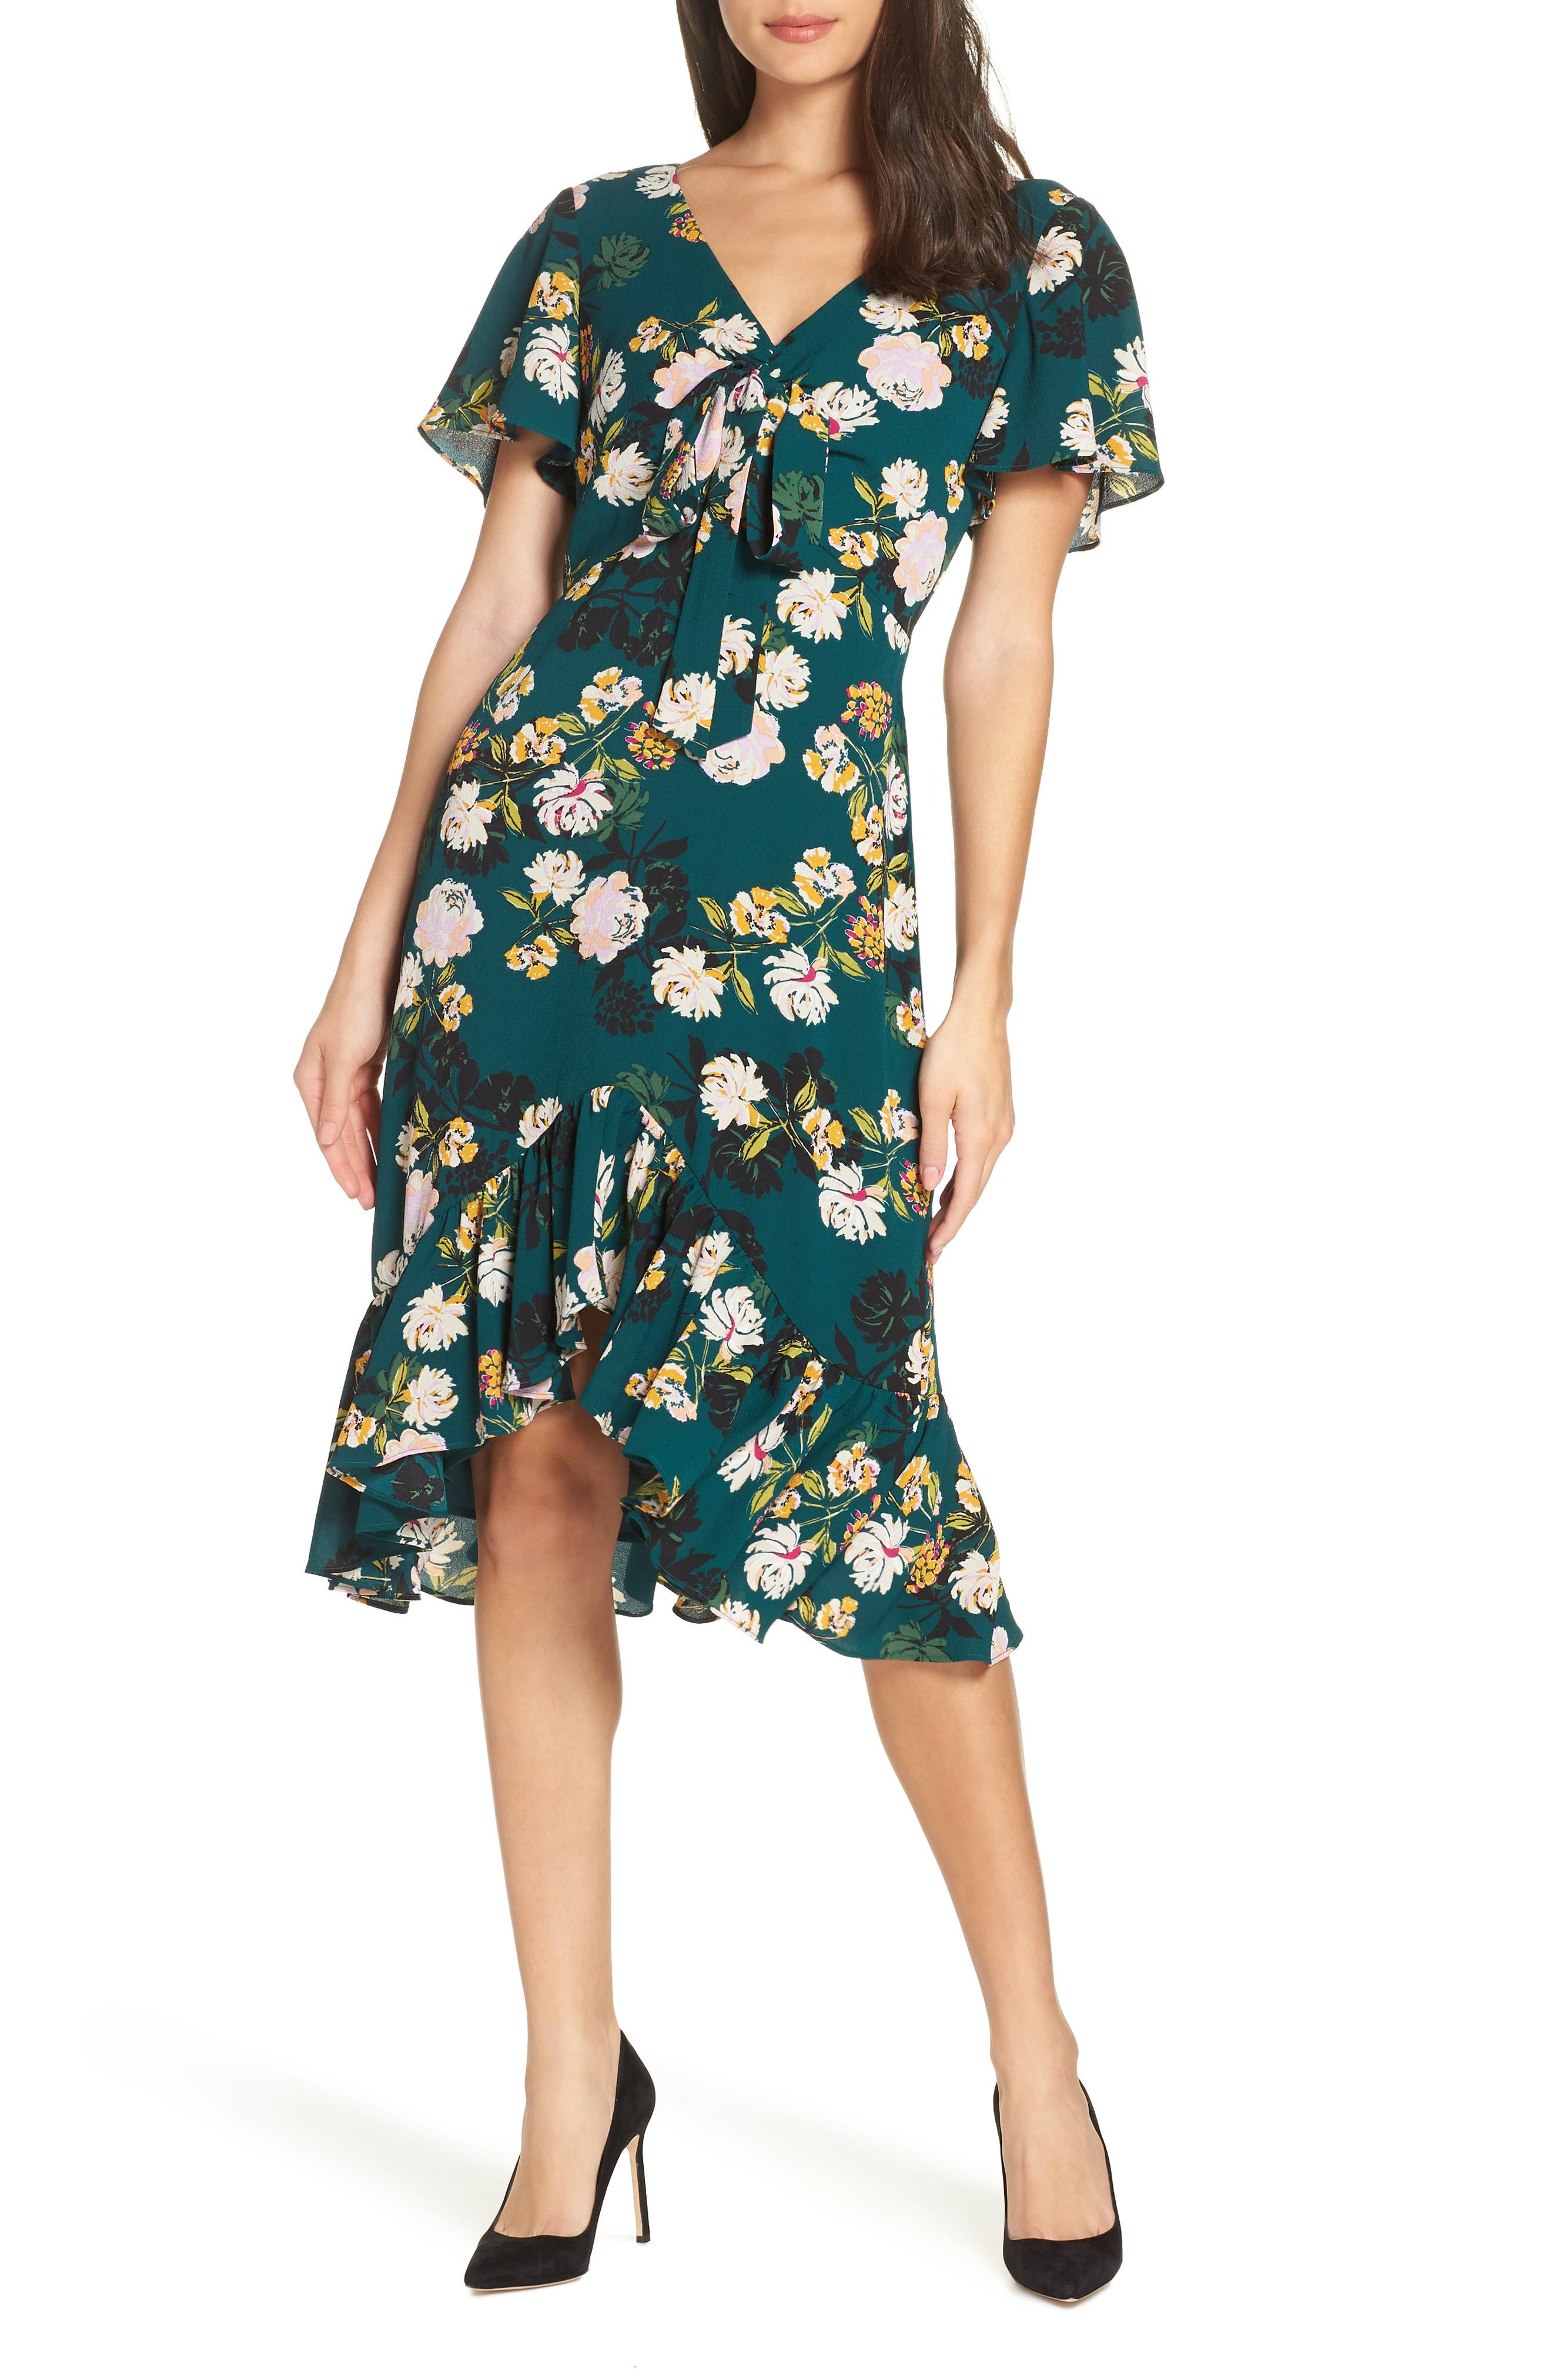 1930s Day Dresses, Afternoon Dresses History Womens Charles Henry Floral Print Ruffle Hem Dress $59.40 AT vintagedancer.com